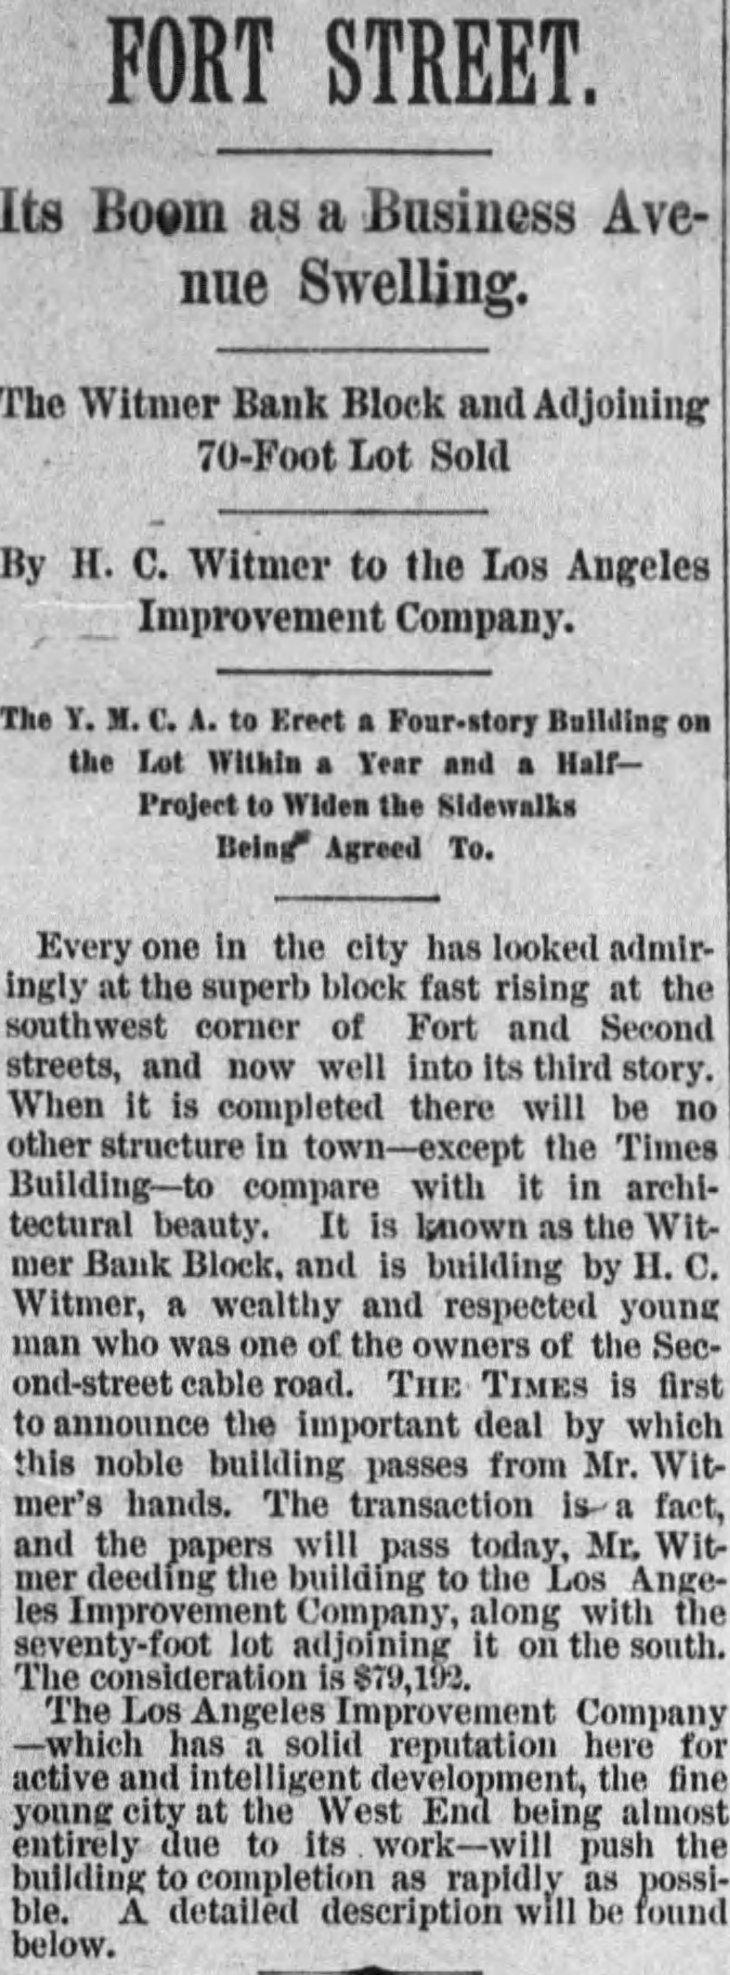 LAICO Bldg Witmer The_Los_Angeles_Times_Thu__Jun_2__1887_